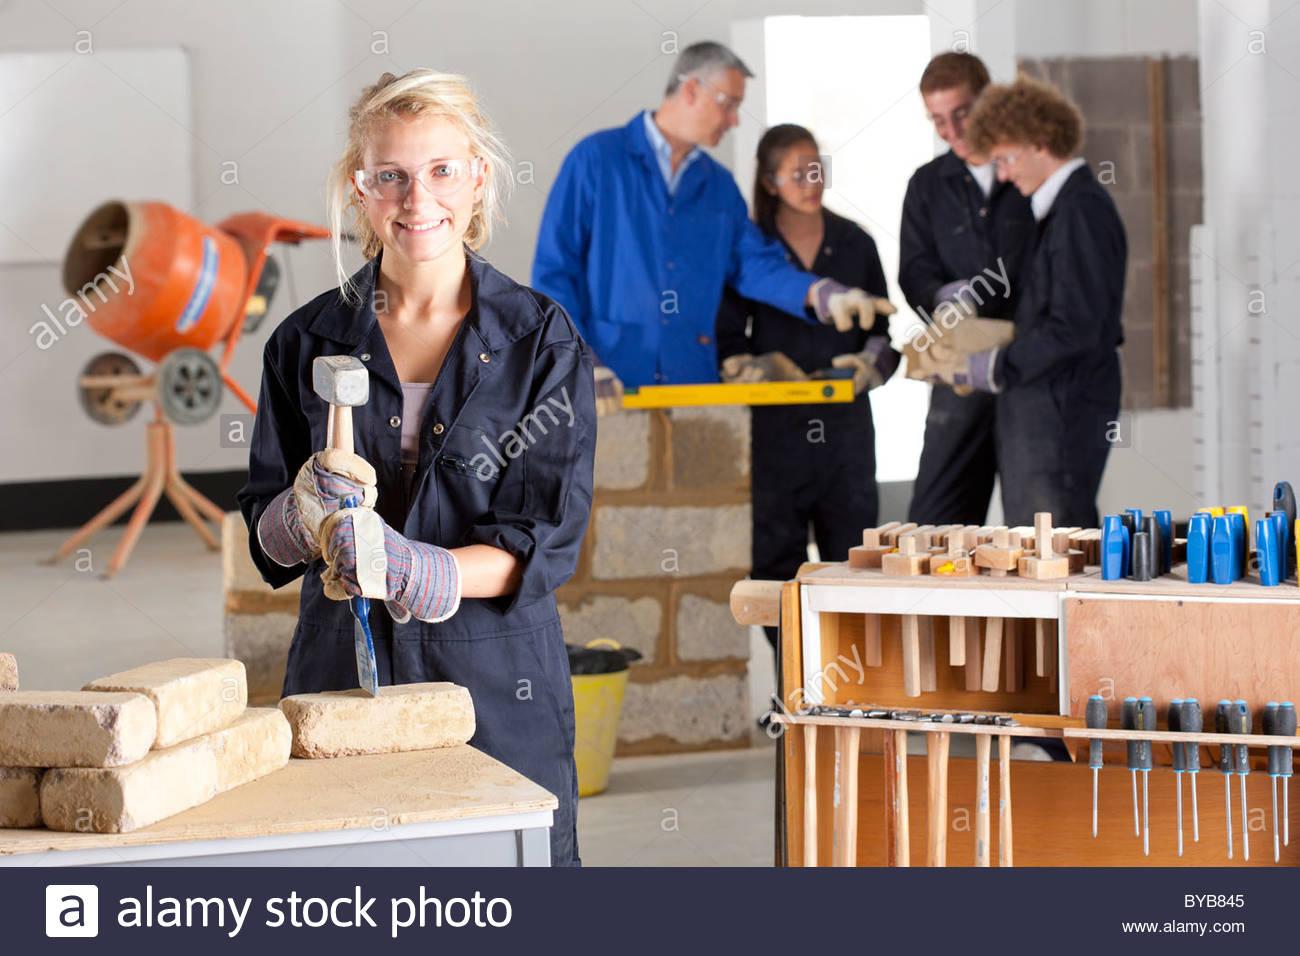 boy with hammer stockfotos boy with hammer bilder alamy. Black Bedroom Furniture Sets. Home Design Ideas